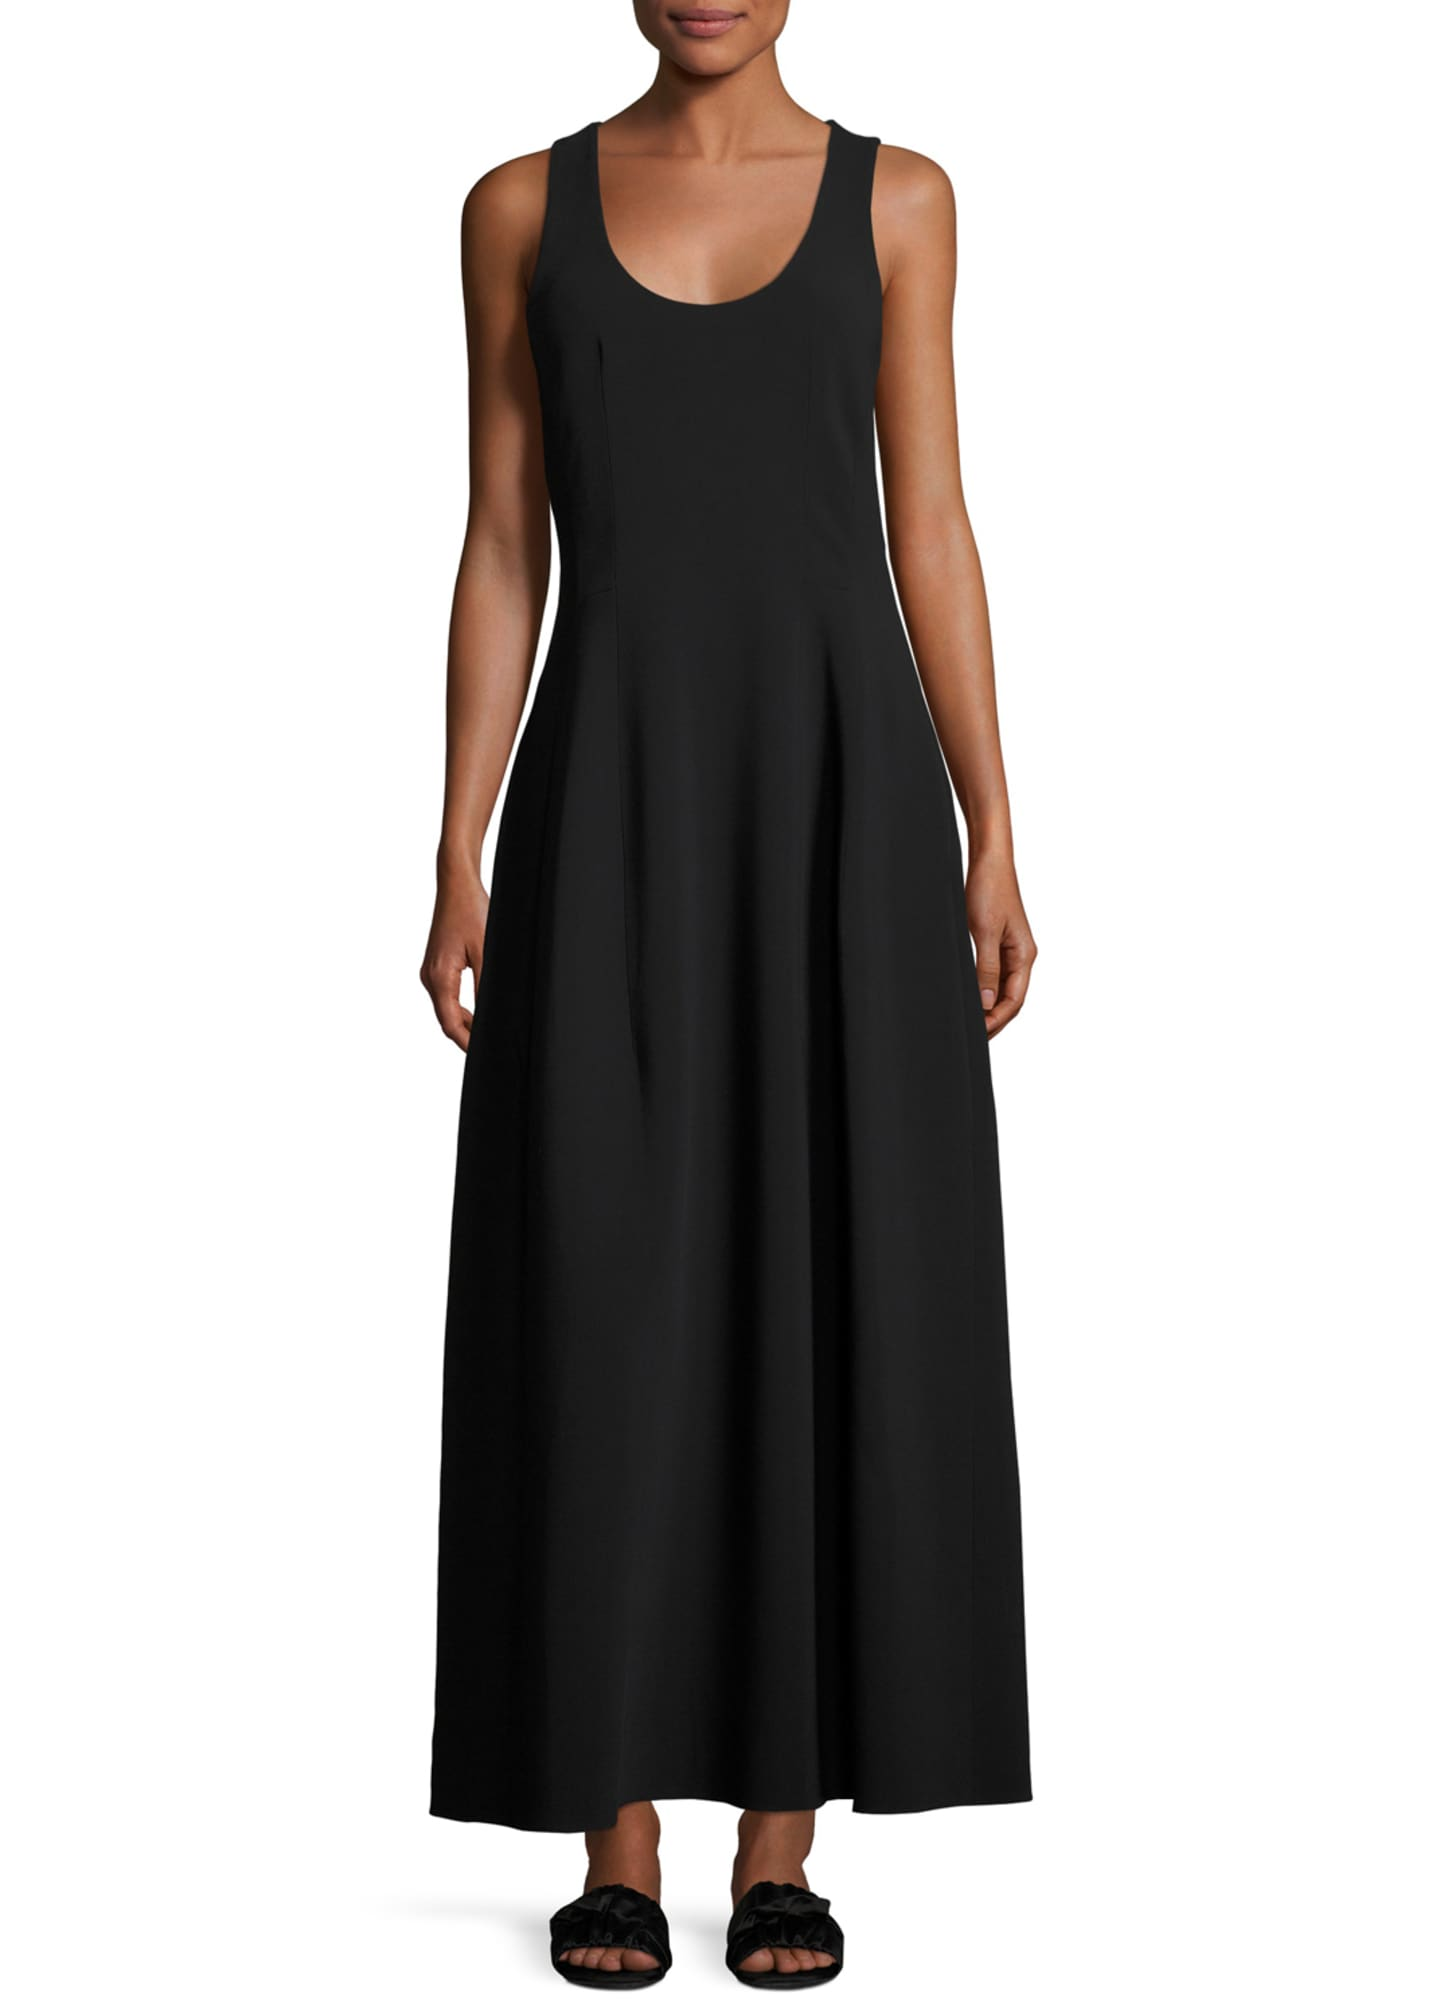 THE ROW Bond Sleeveless Scoop-Neck Maxi Dress